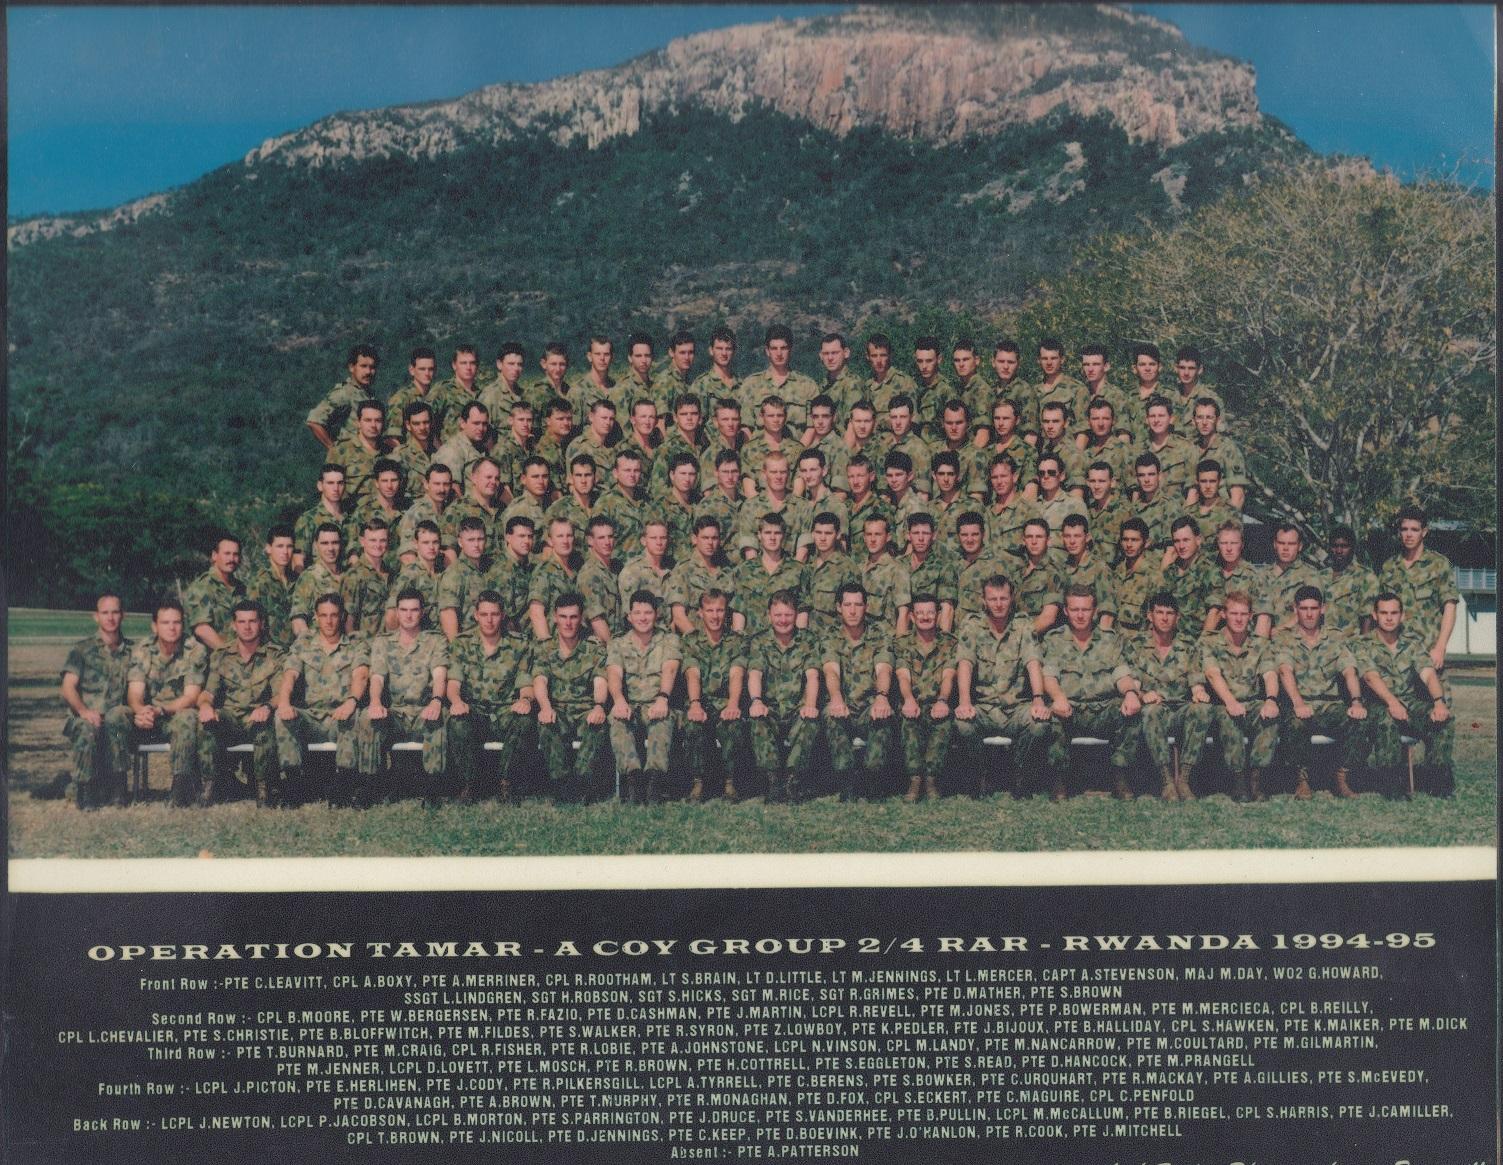 A Coy Group OP TAMAR - Rwanda 1994/95